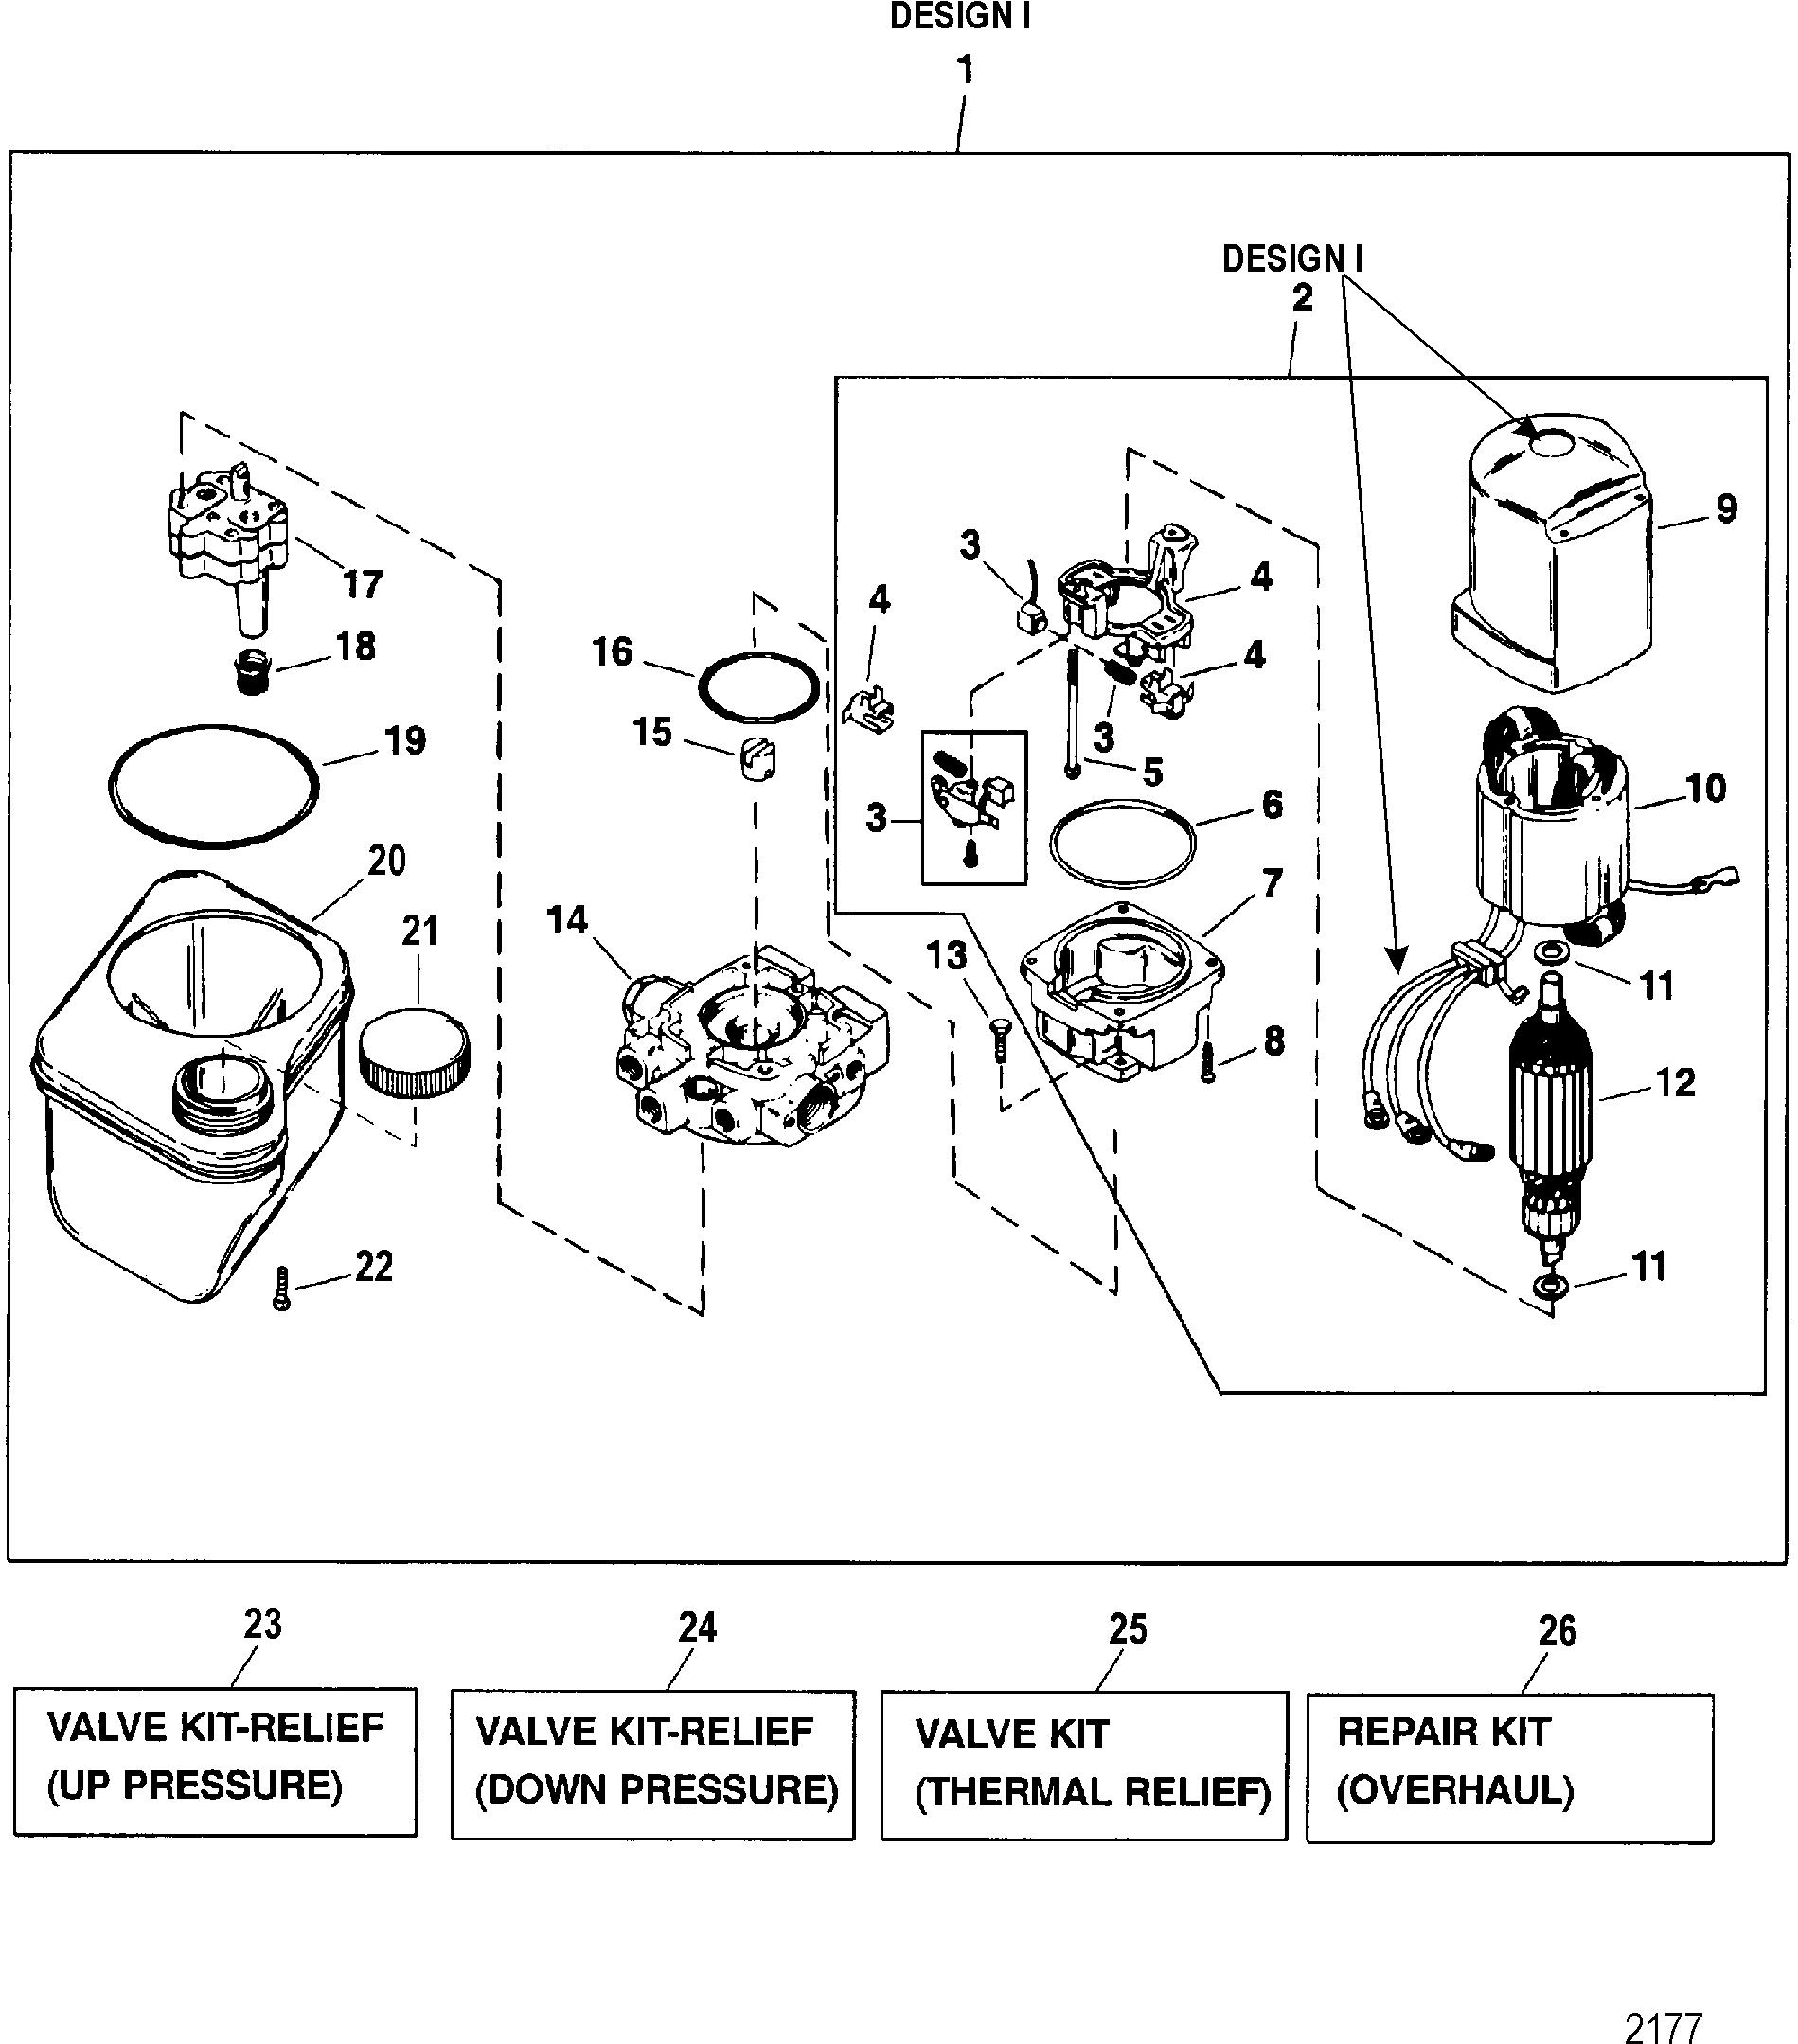 Cp Performance - Pump - Motor  Bottom Mt Reservoir   Design I